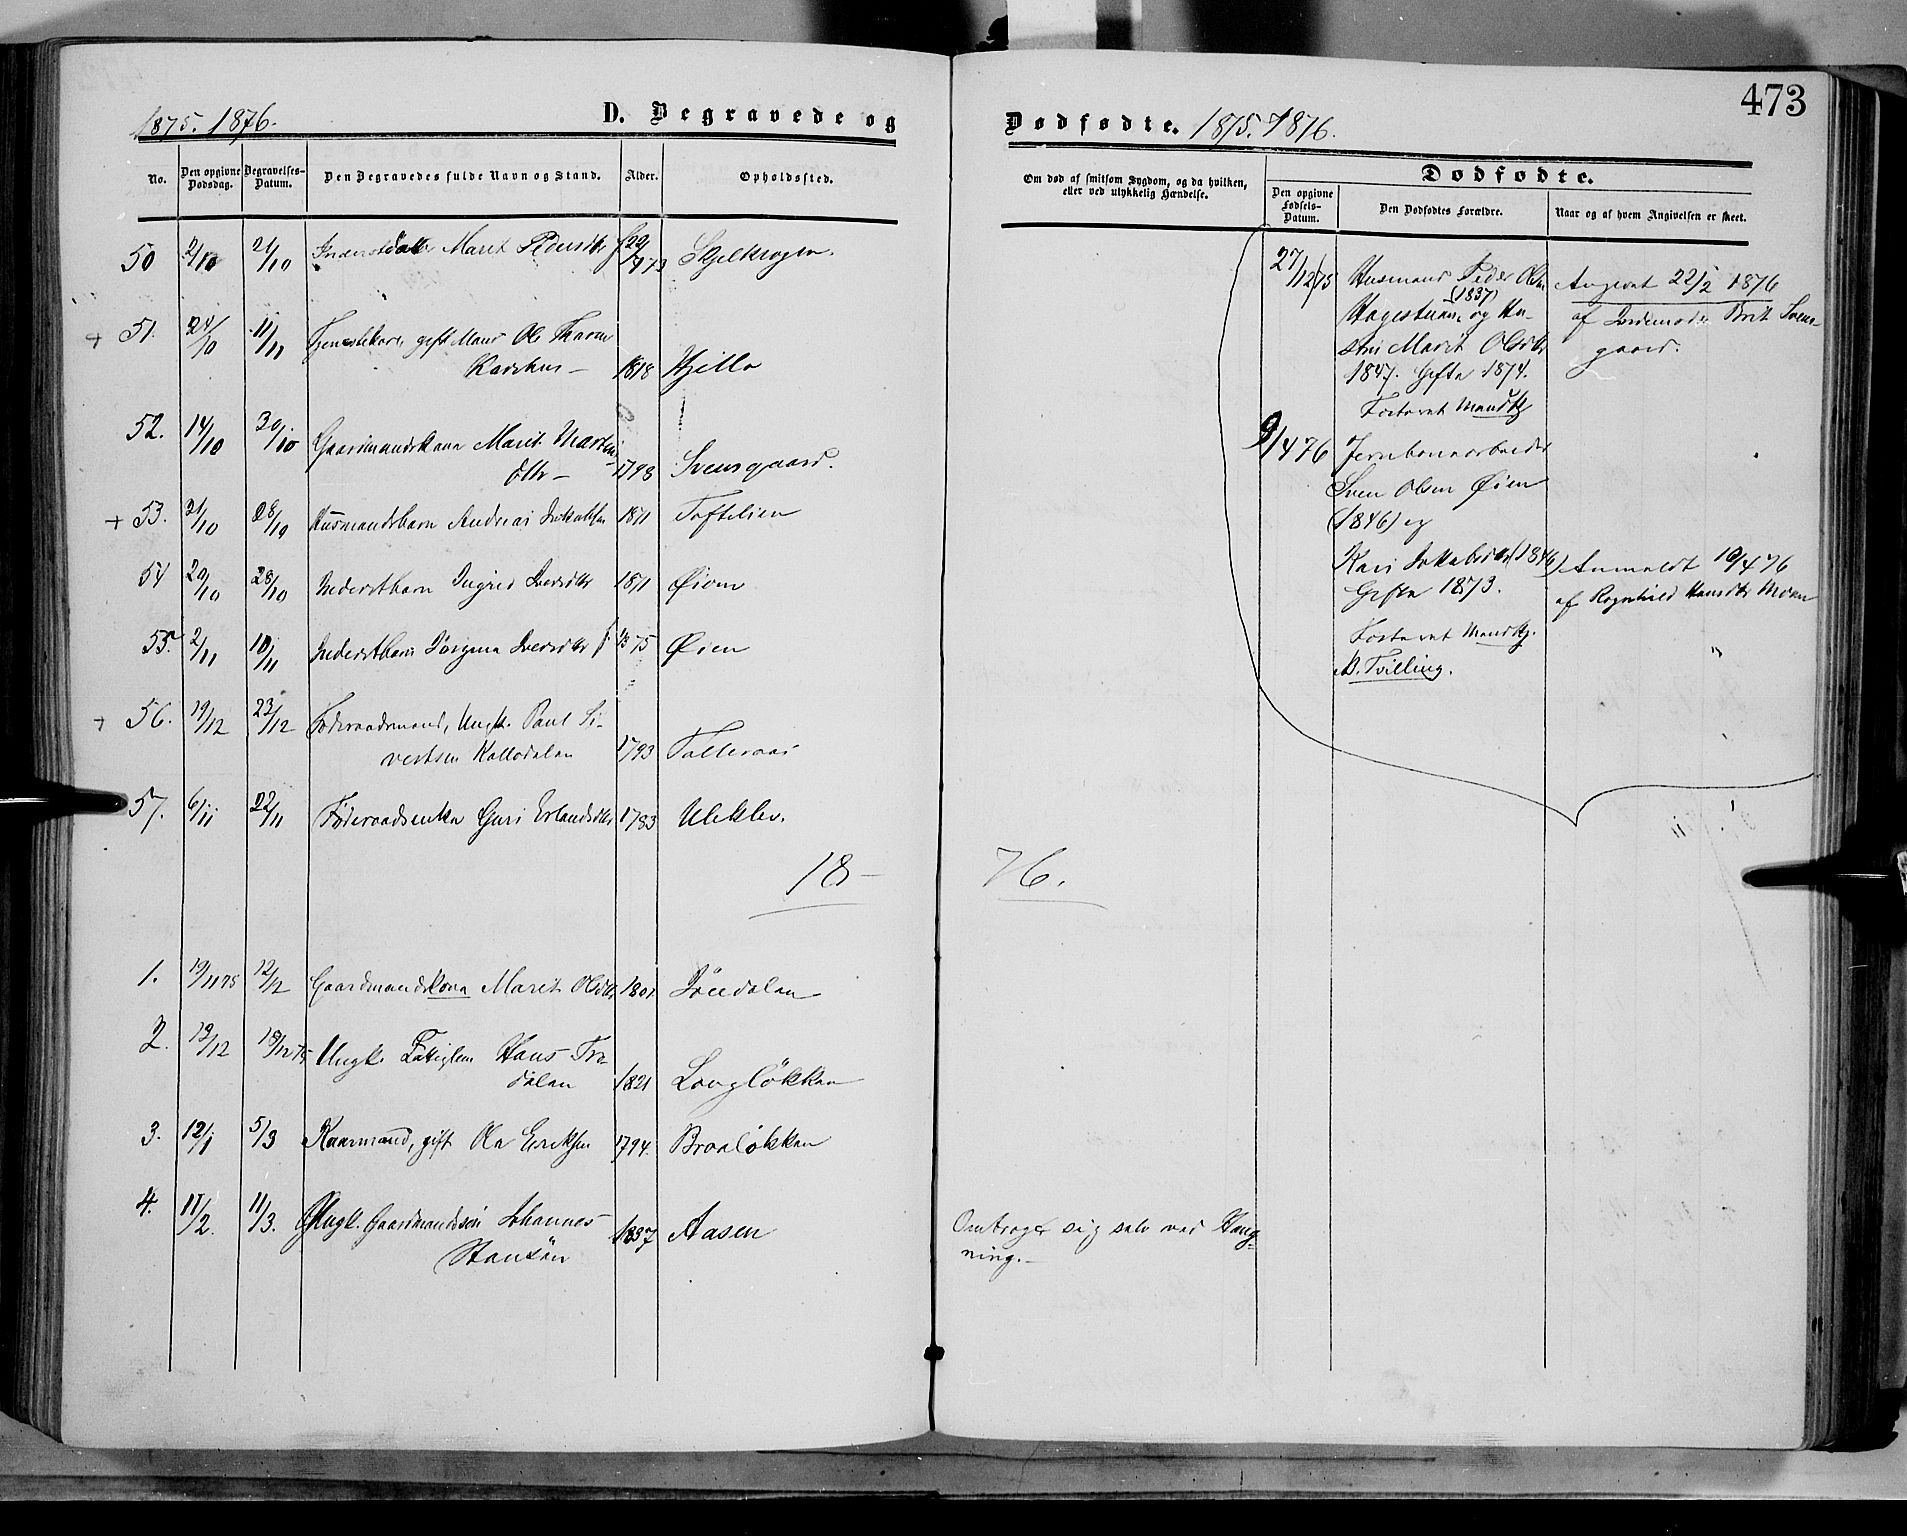 SAH, Dovre prestekontor, Ministerialbok nr. 1, 1854-1878, s. 473